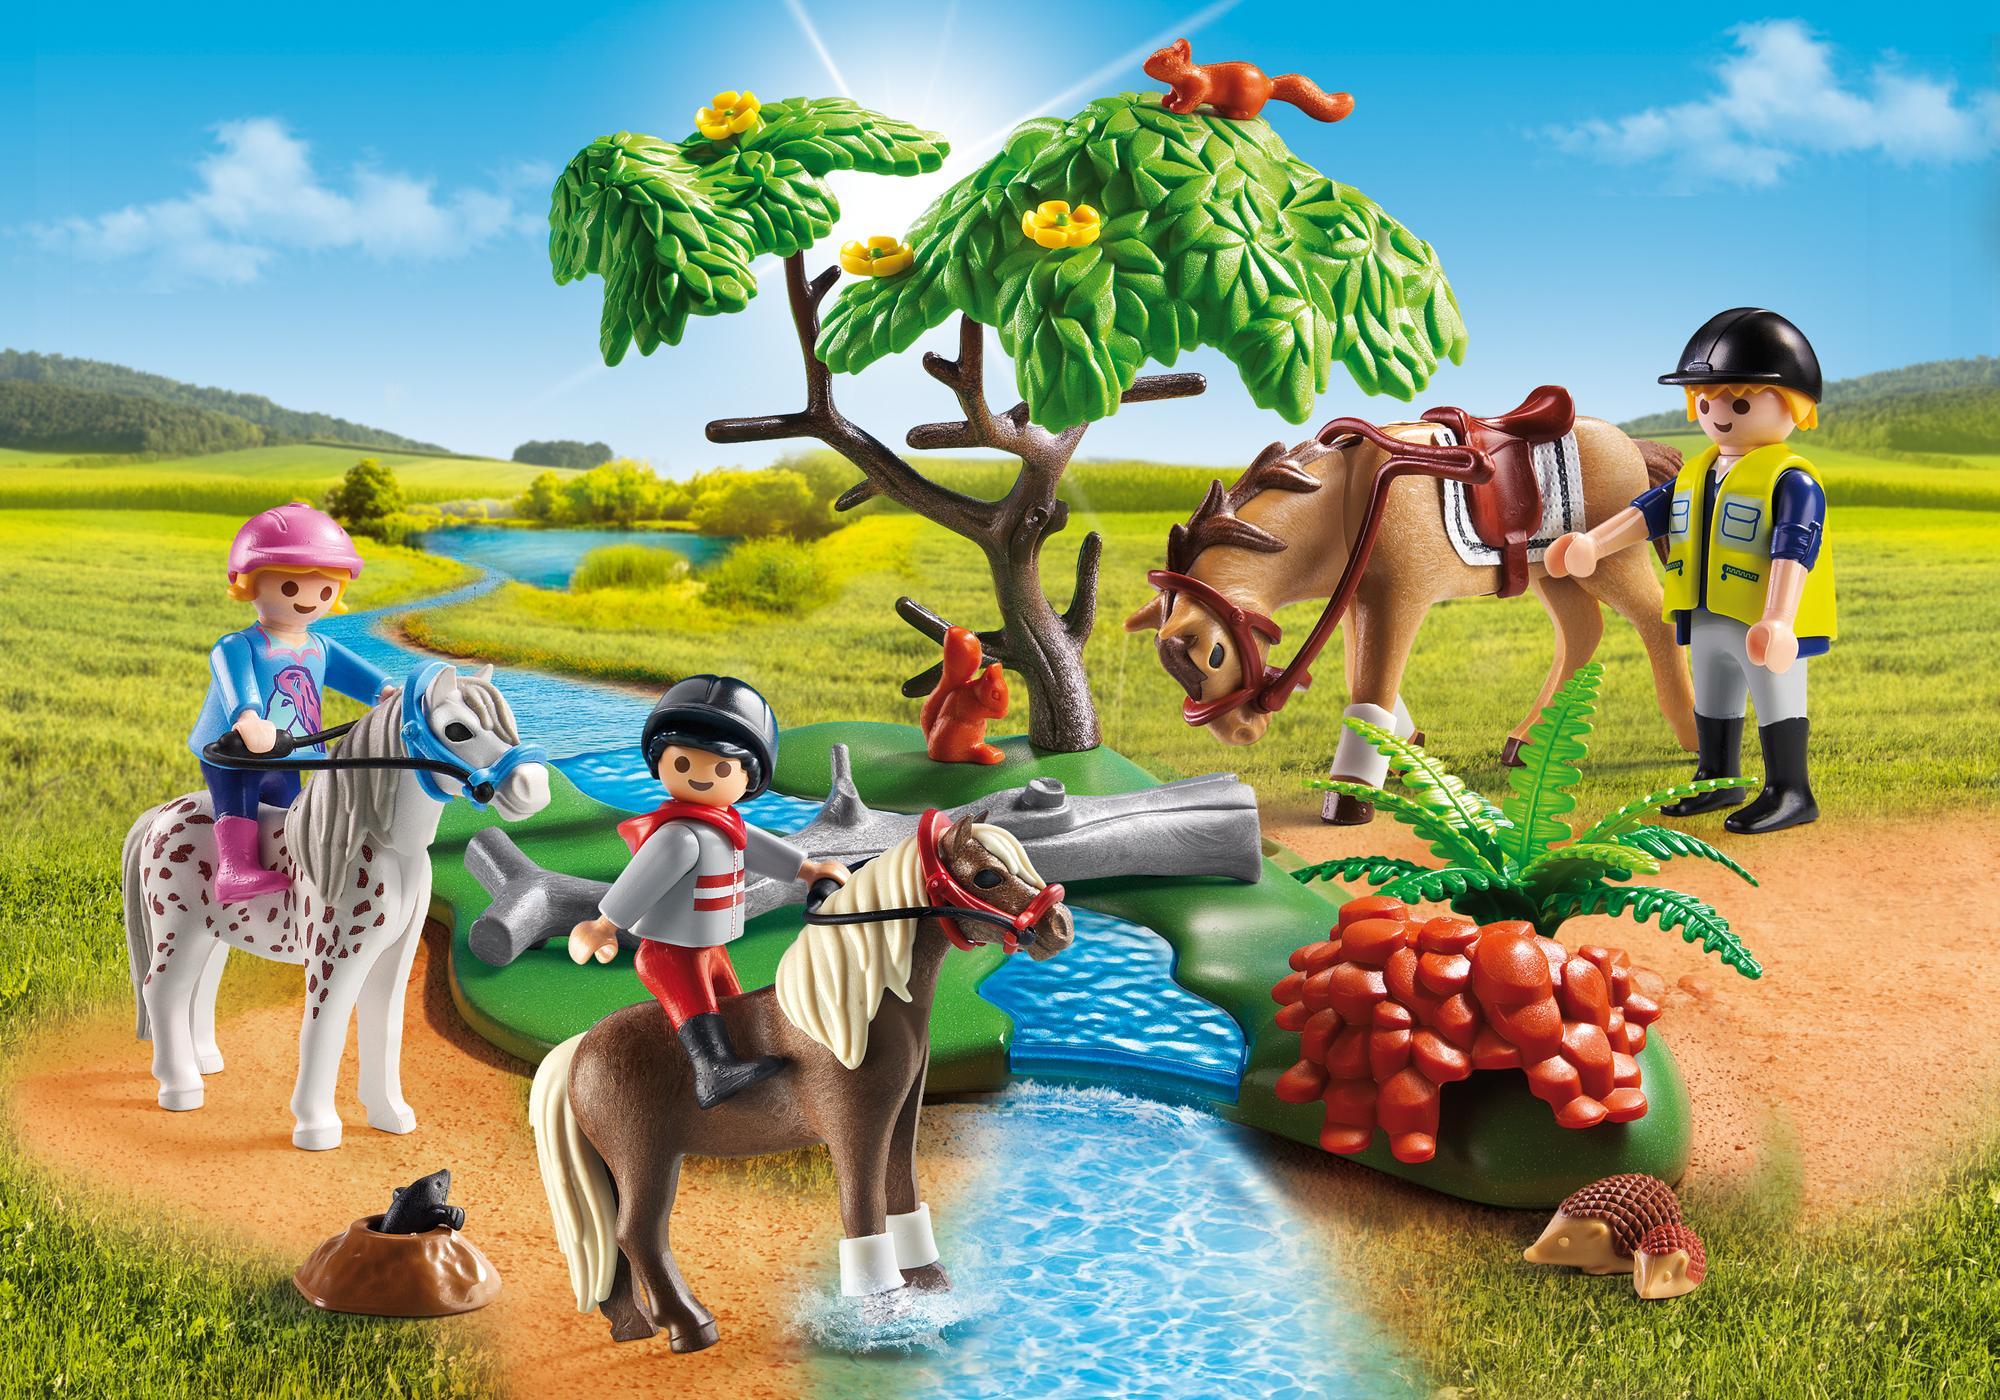 http://media.playmobil.com/i/playmobil/6947_product_detail/Country Horseback Ride